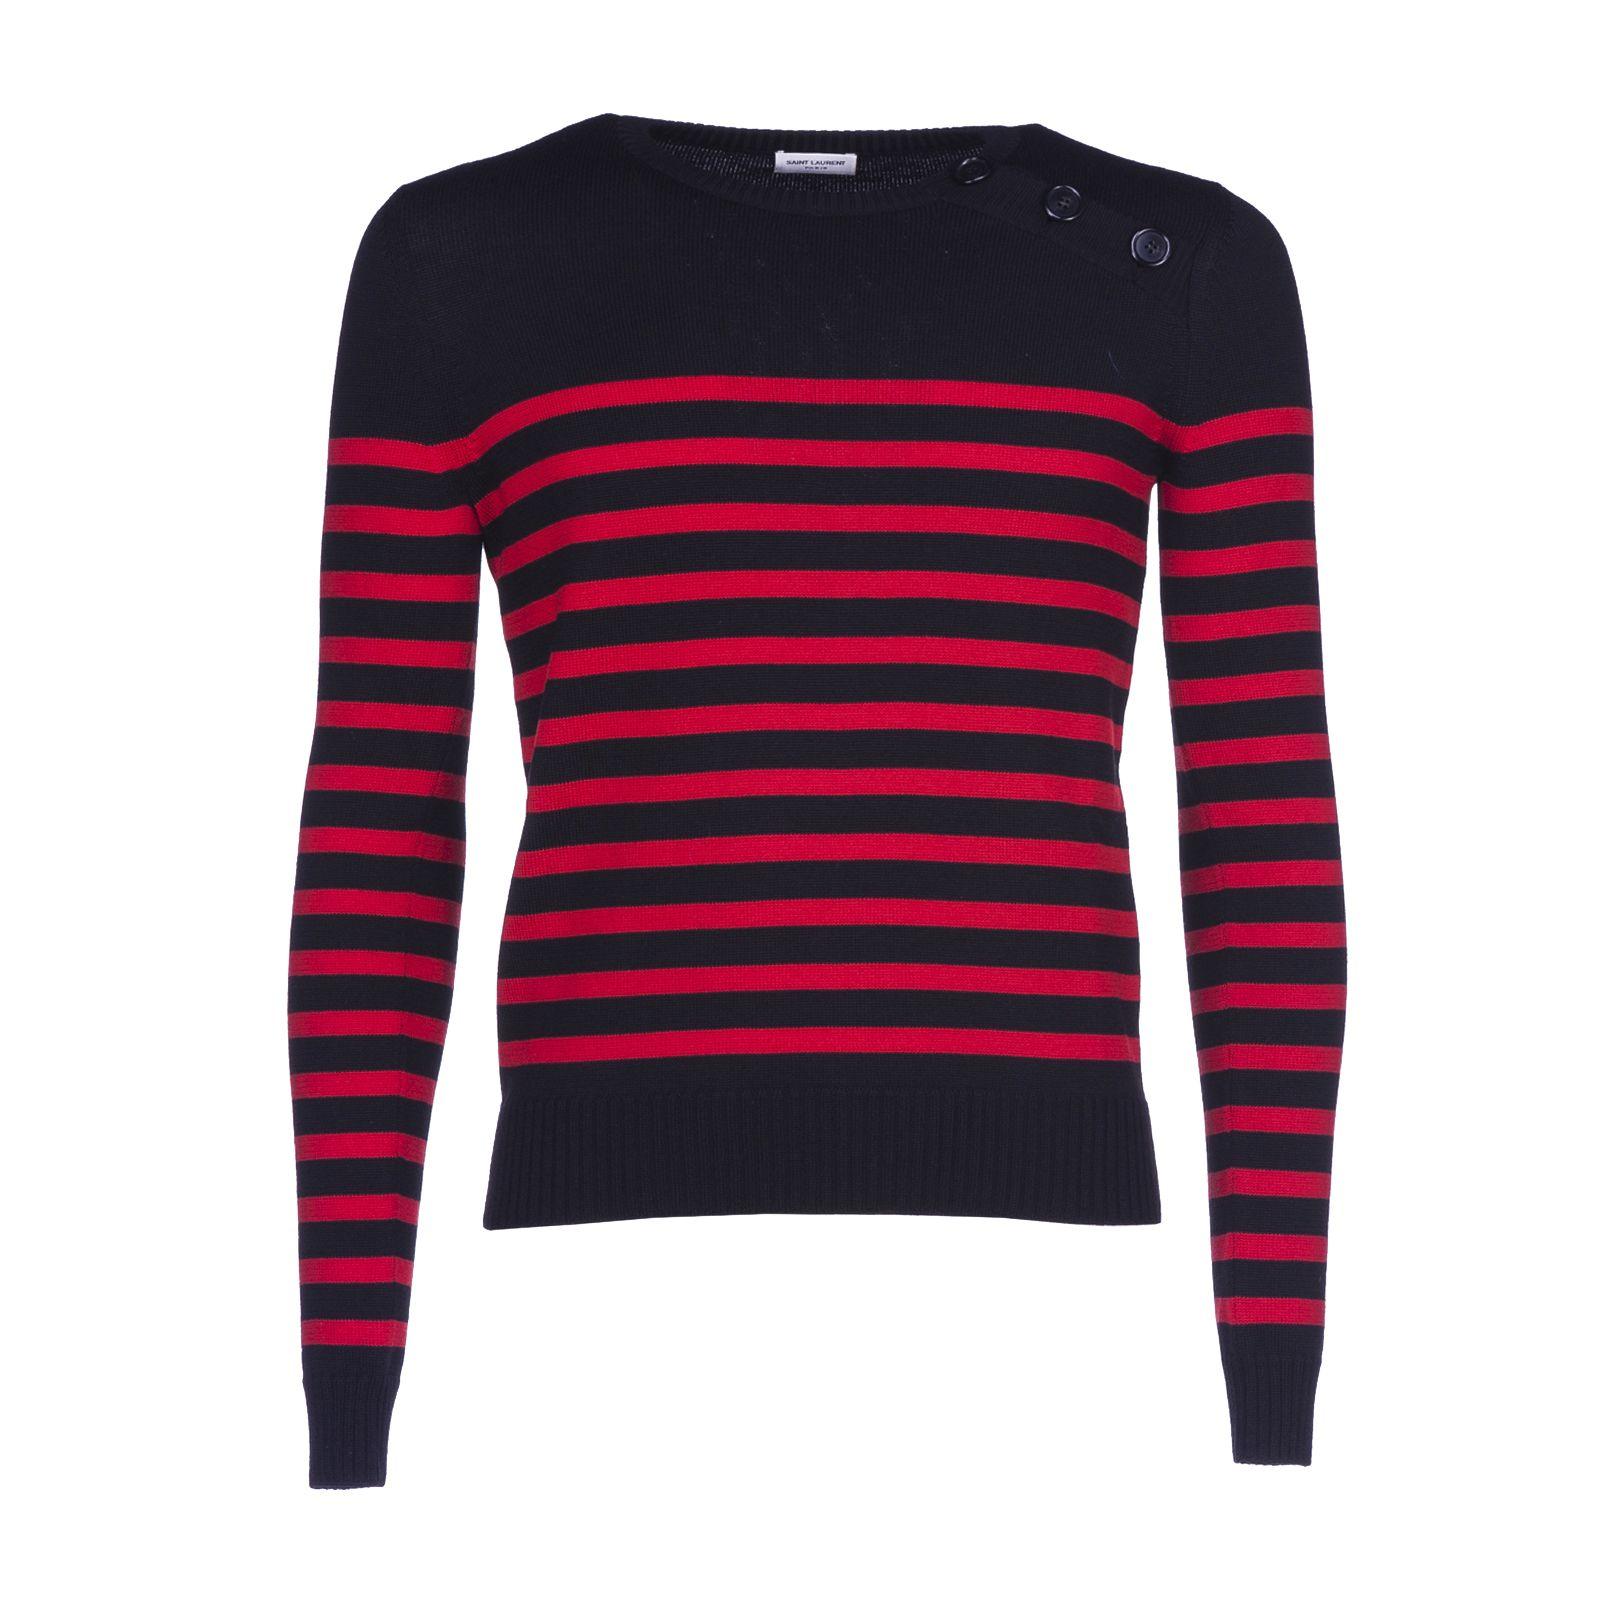 Saint Laurent Paris Stripe Sweater